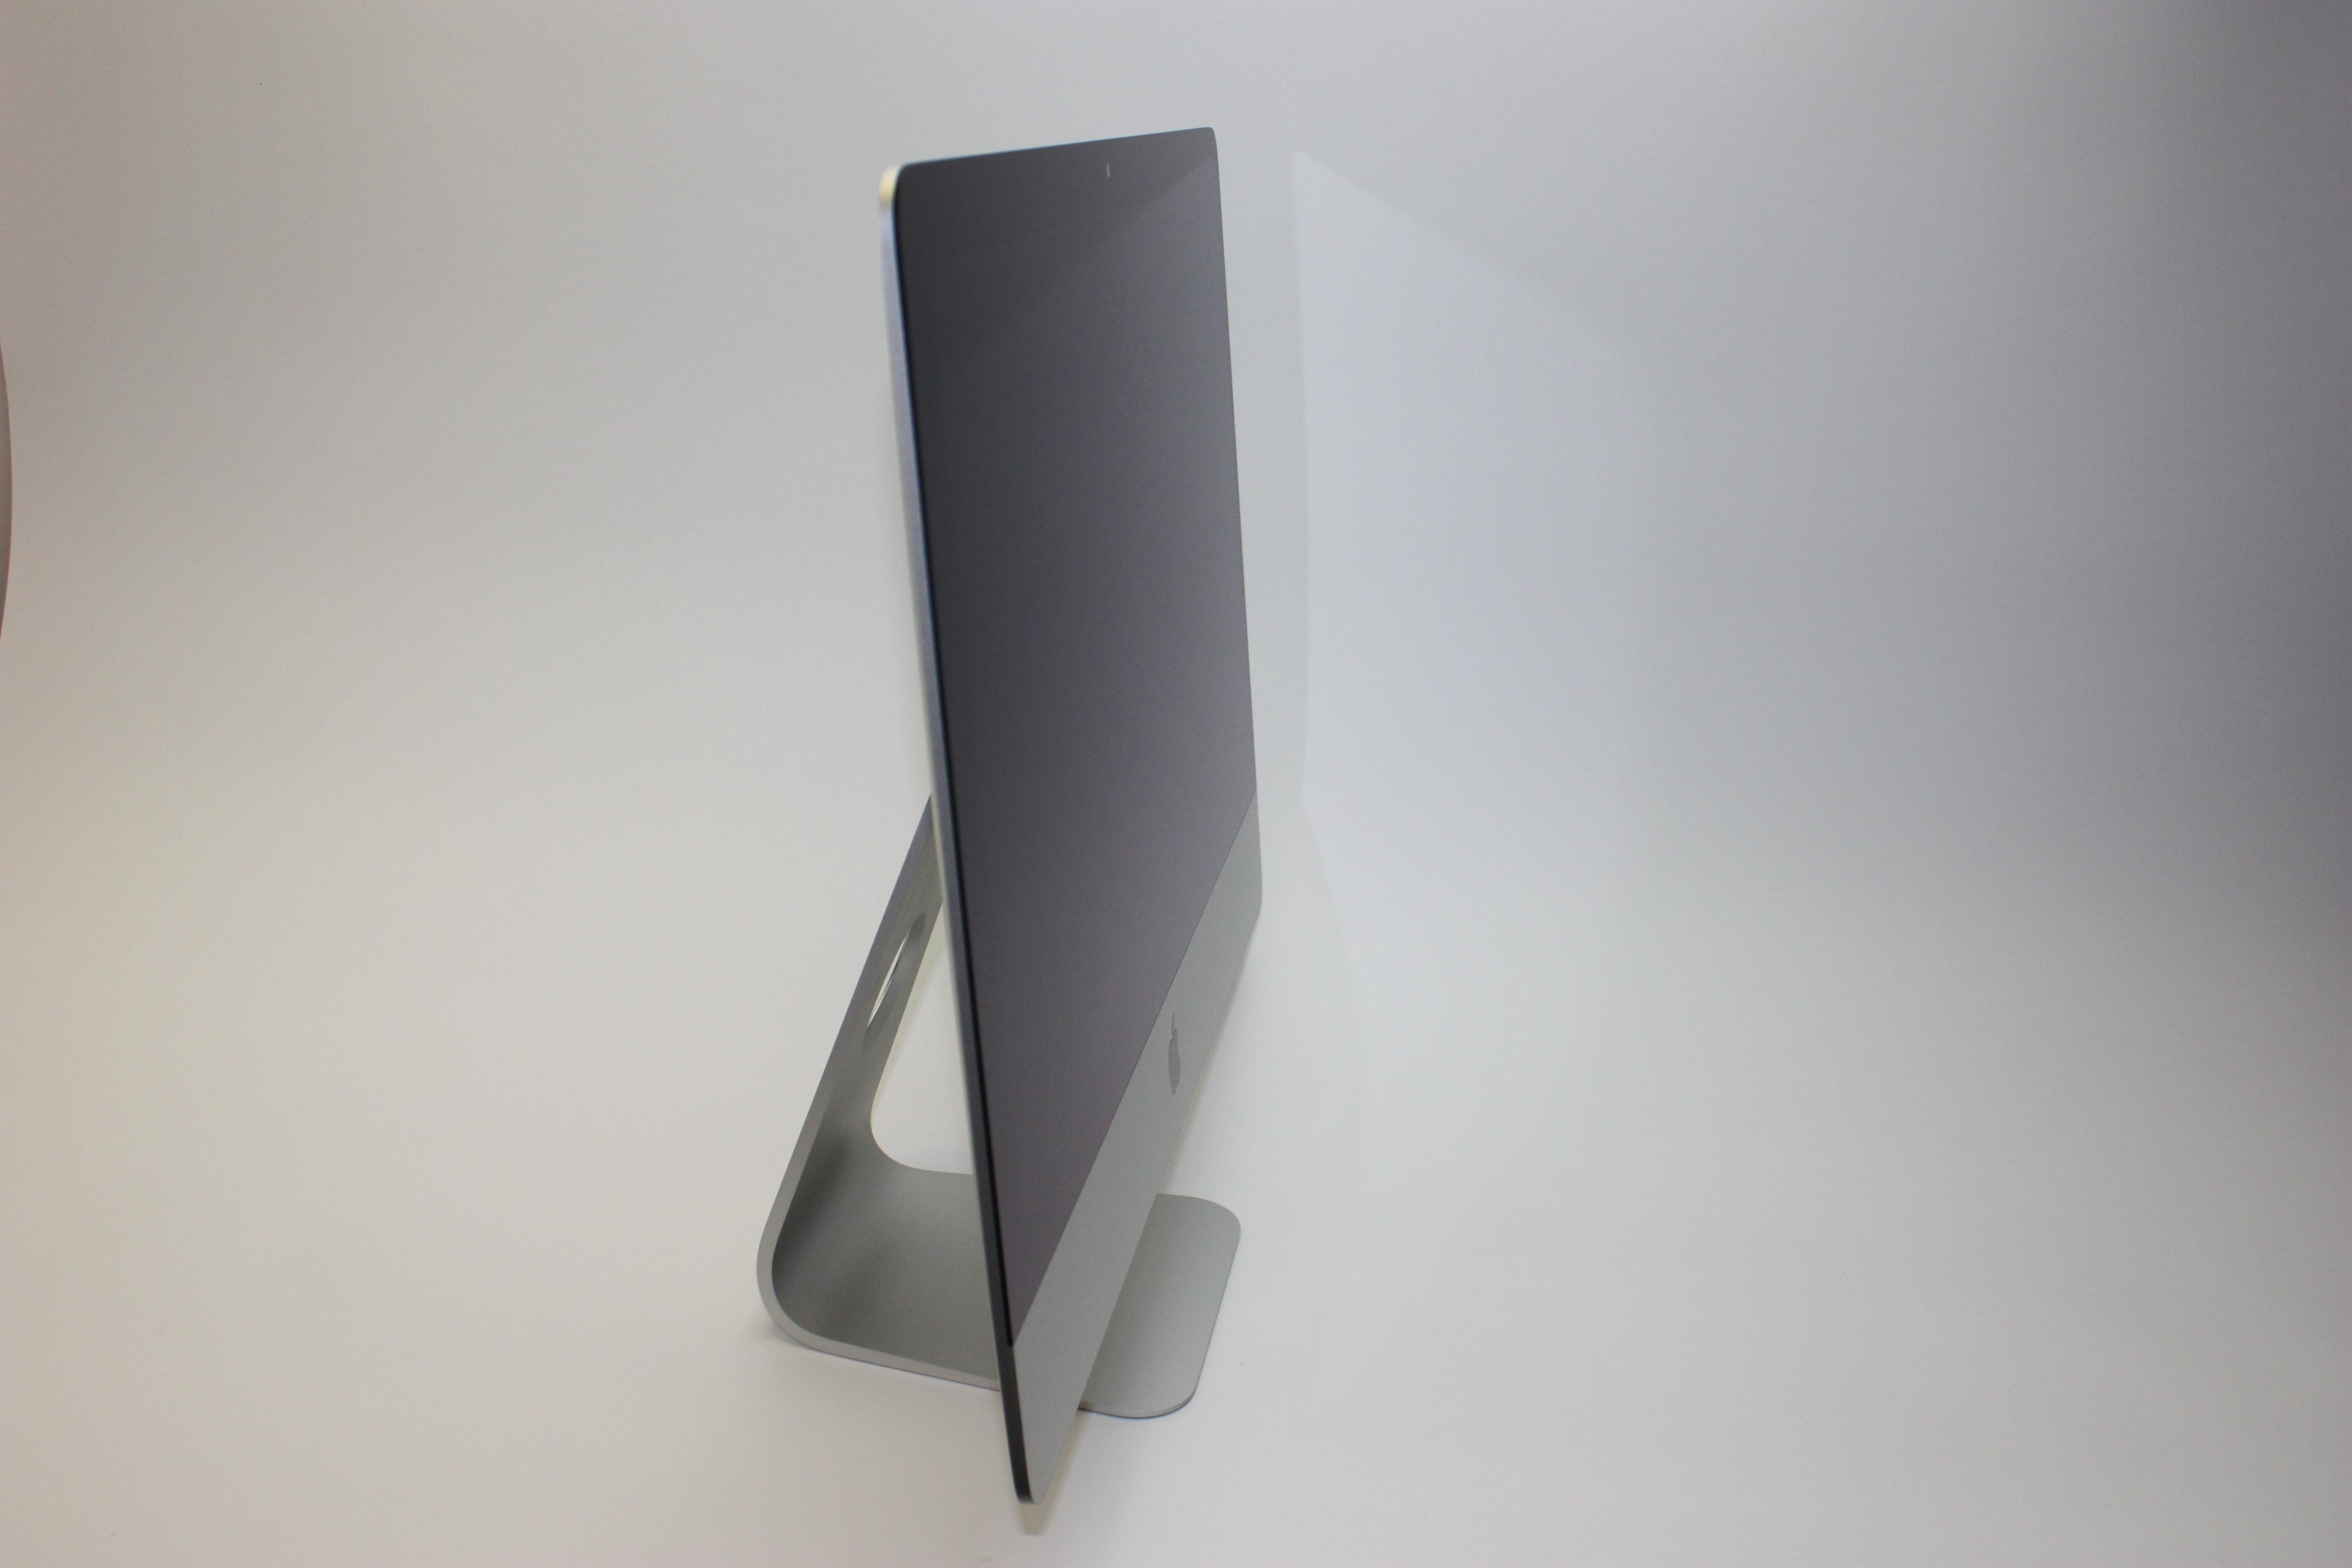 iMac Retina 4K 21.5-inch, 3.0 GHz Core i5, 8 GB 2400 MHz DDR4, 1 TB SATA Disk, image 3